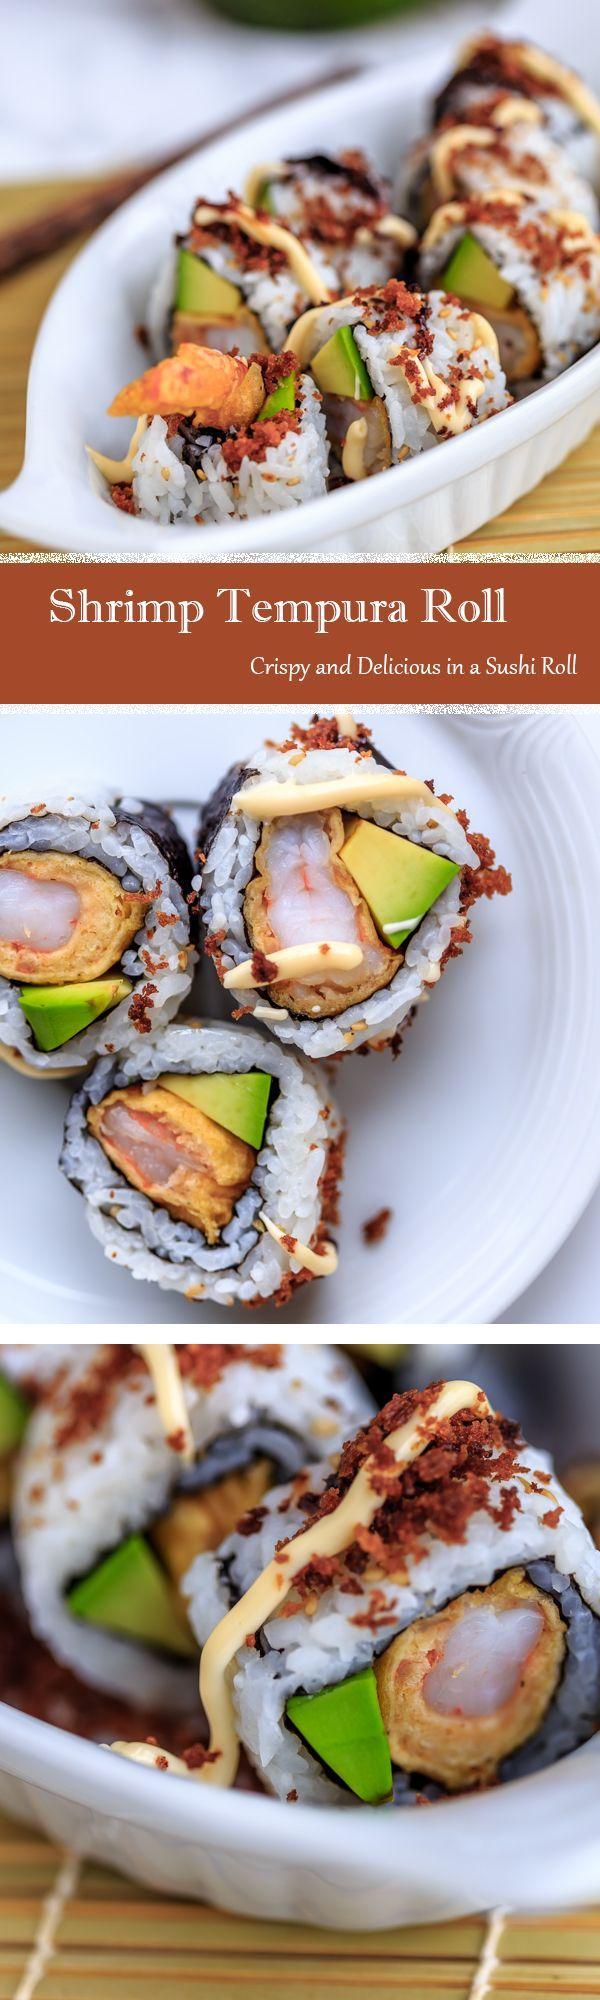 Recipe for Shrimp Tempura Sushi Roll